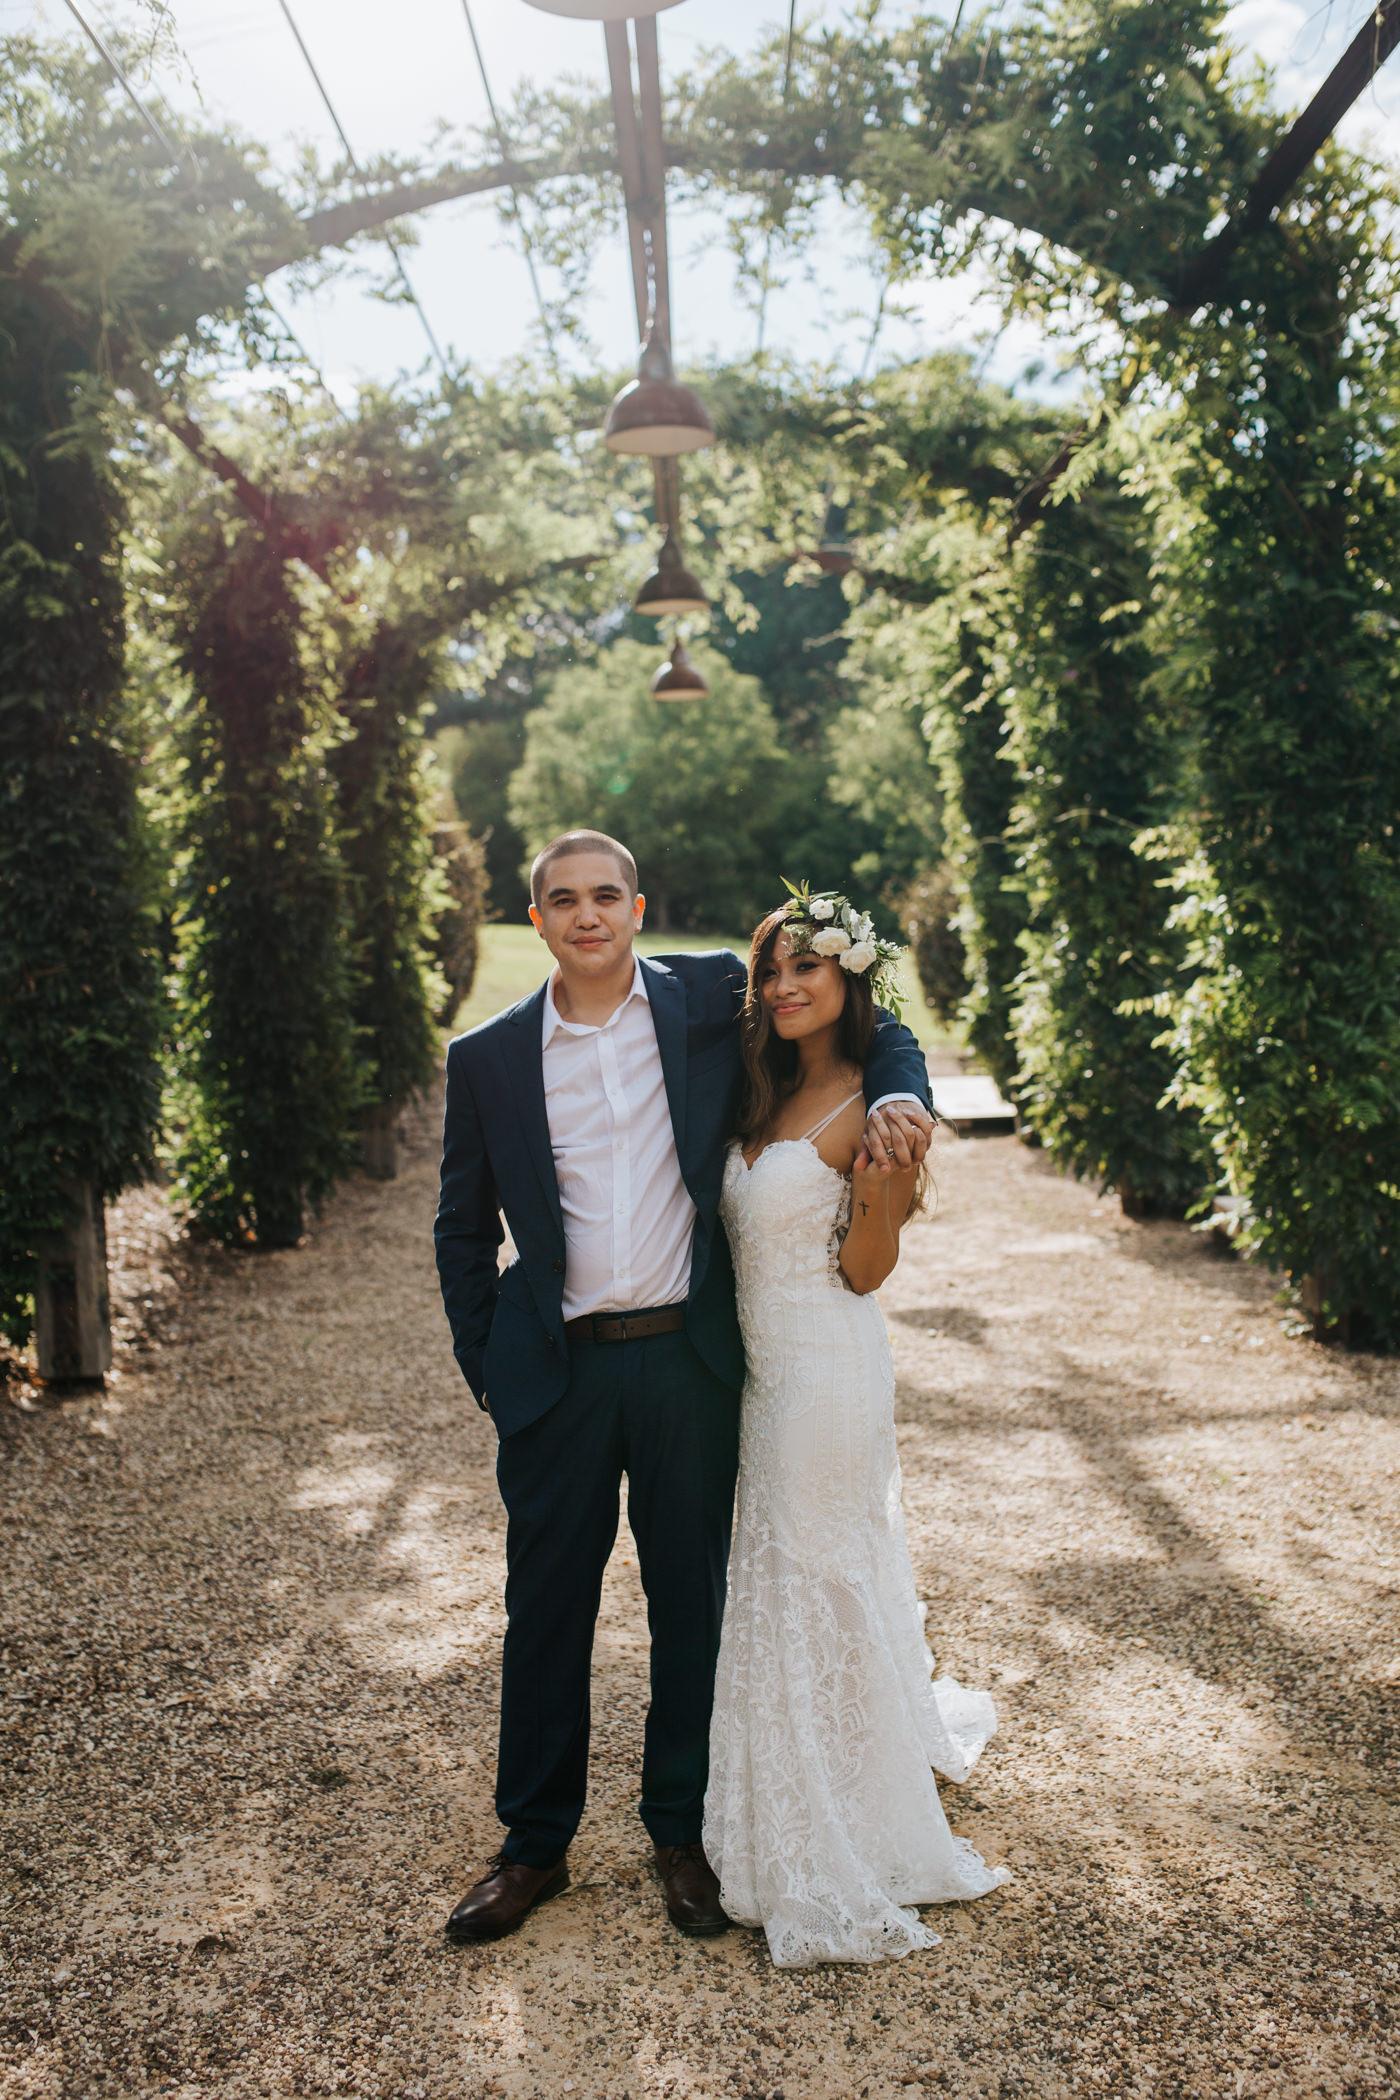 Nick & Vanezza - Fernbank Farm Wedding - Samantha Heather Photography-133.jpg